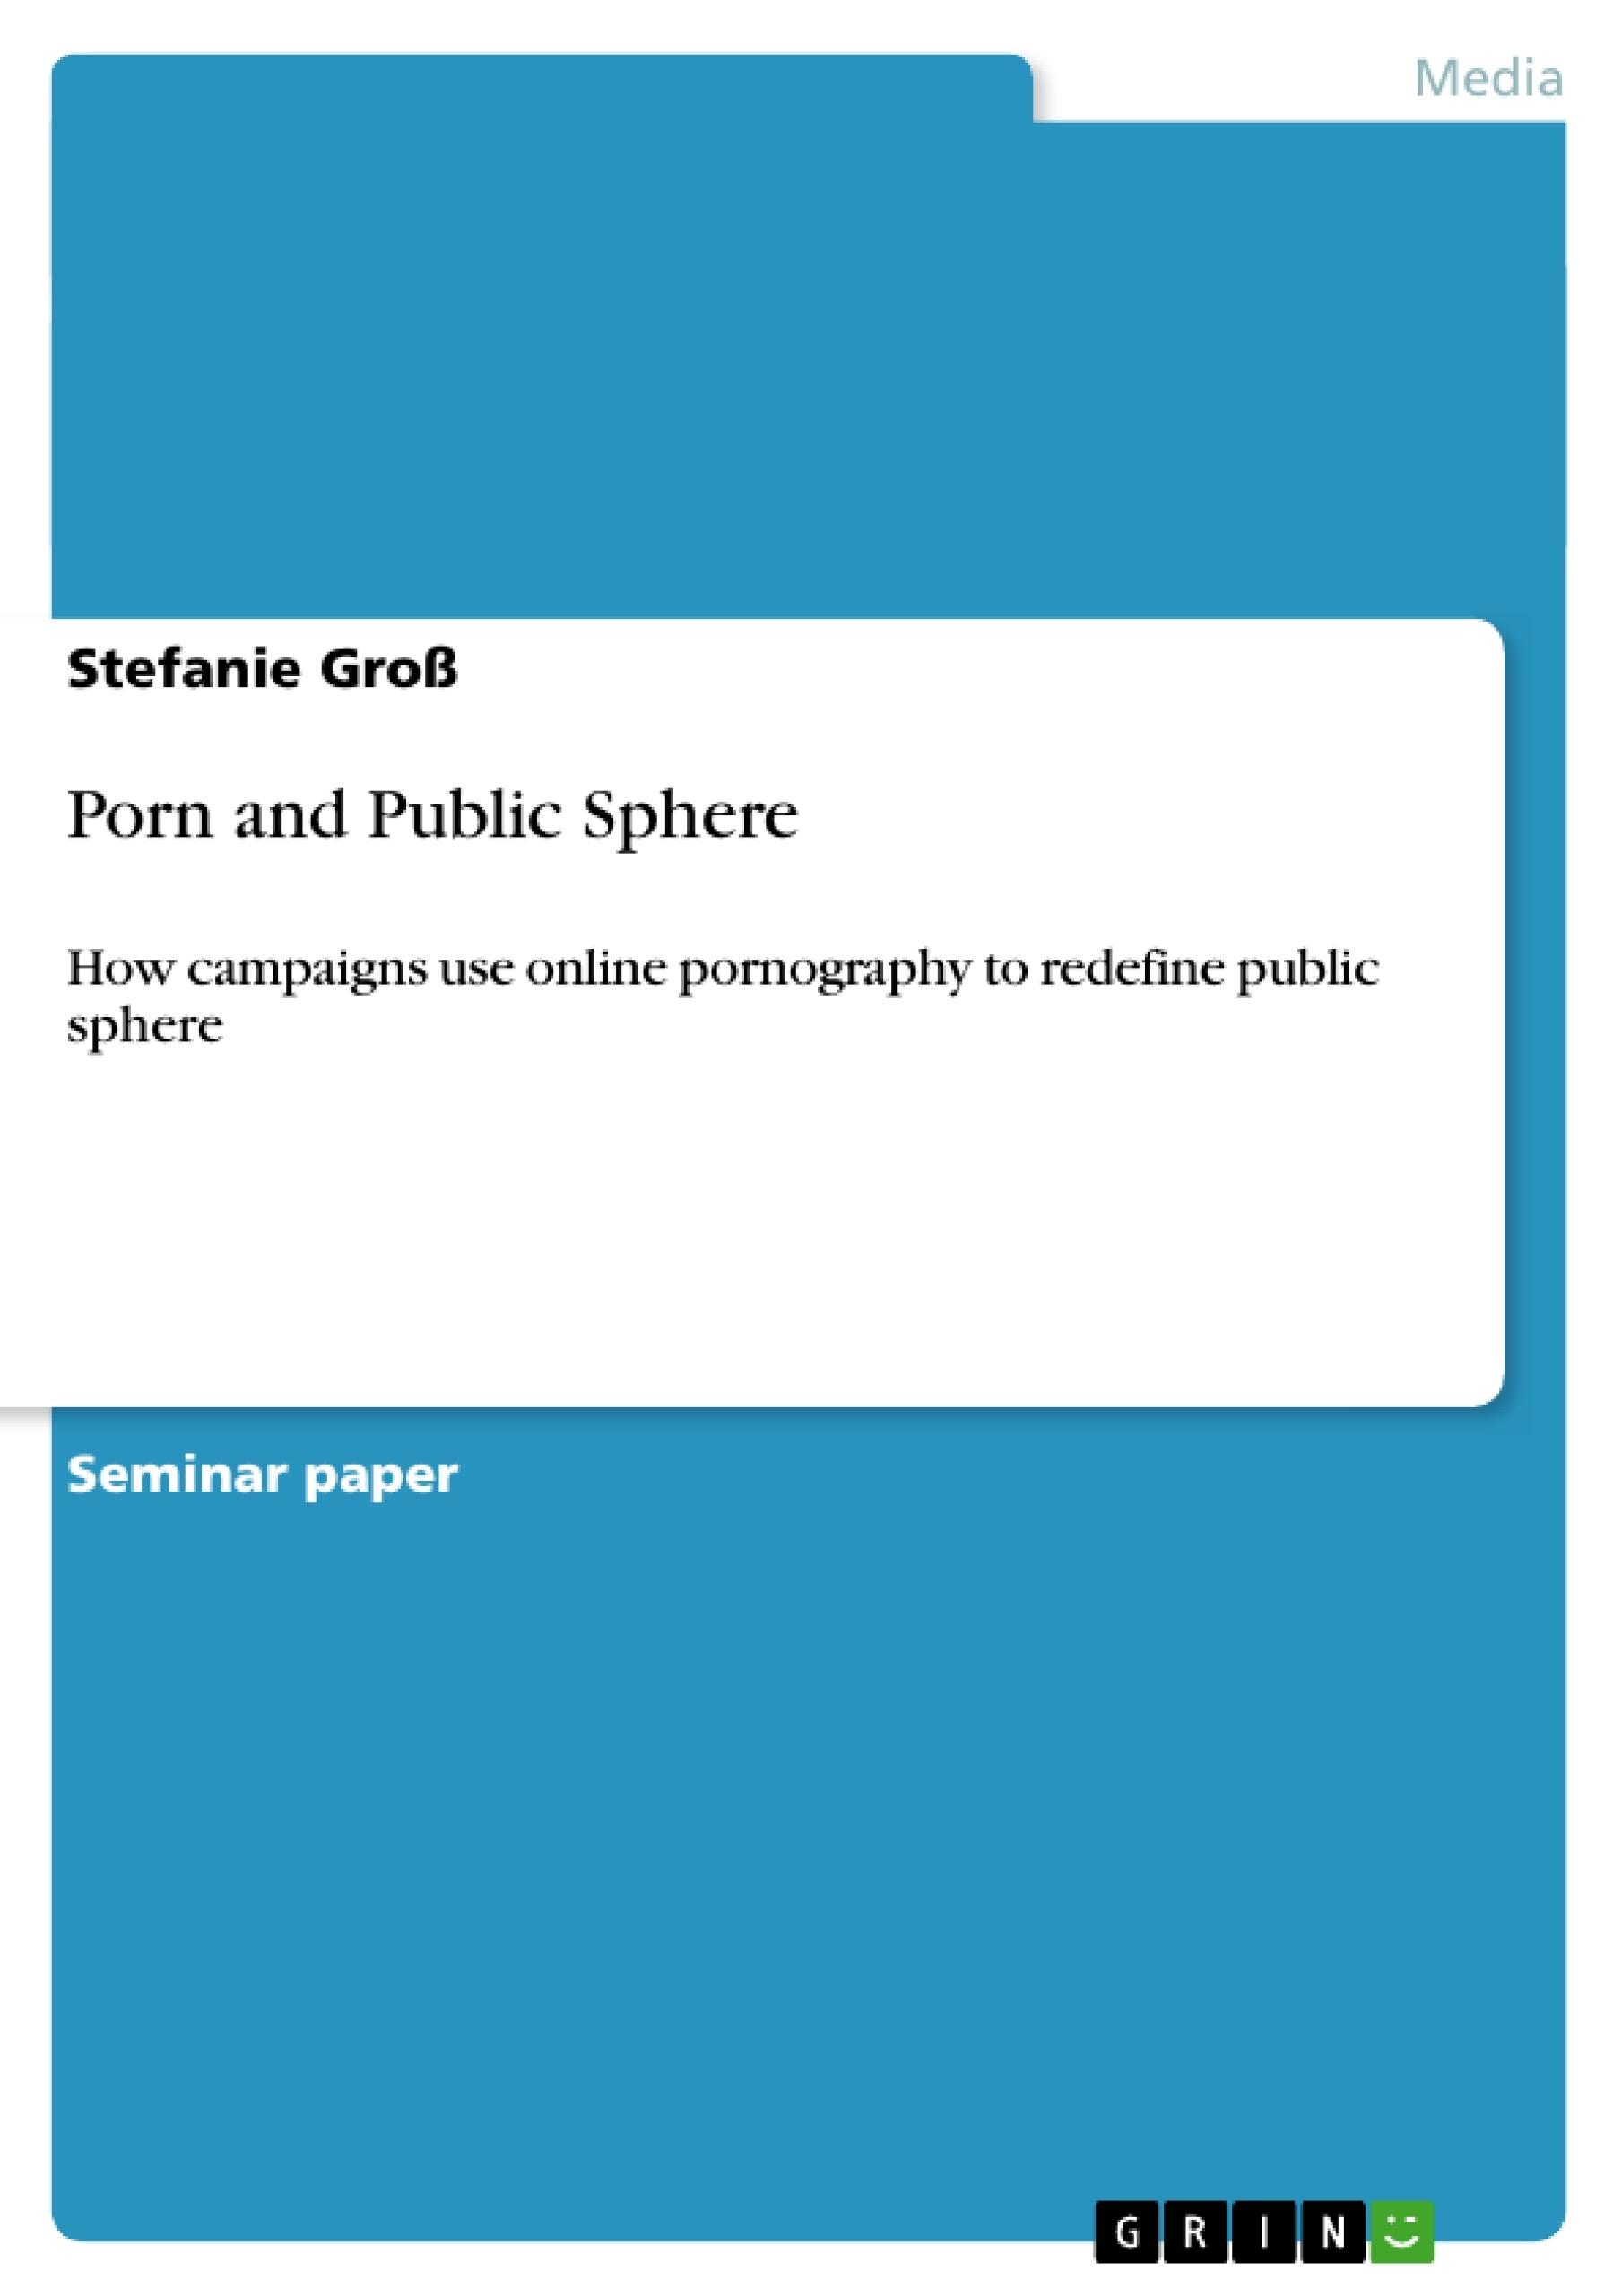 Title: Porn and Public Sphere